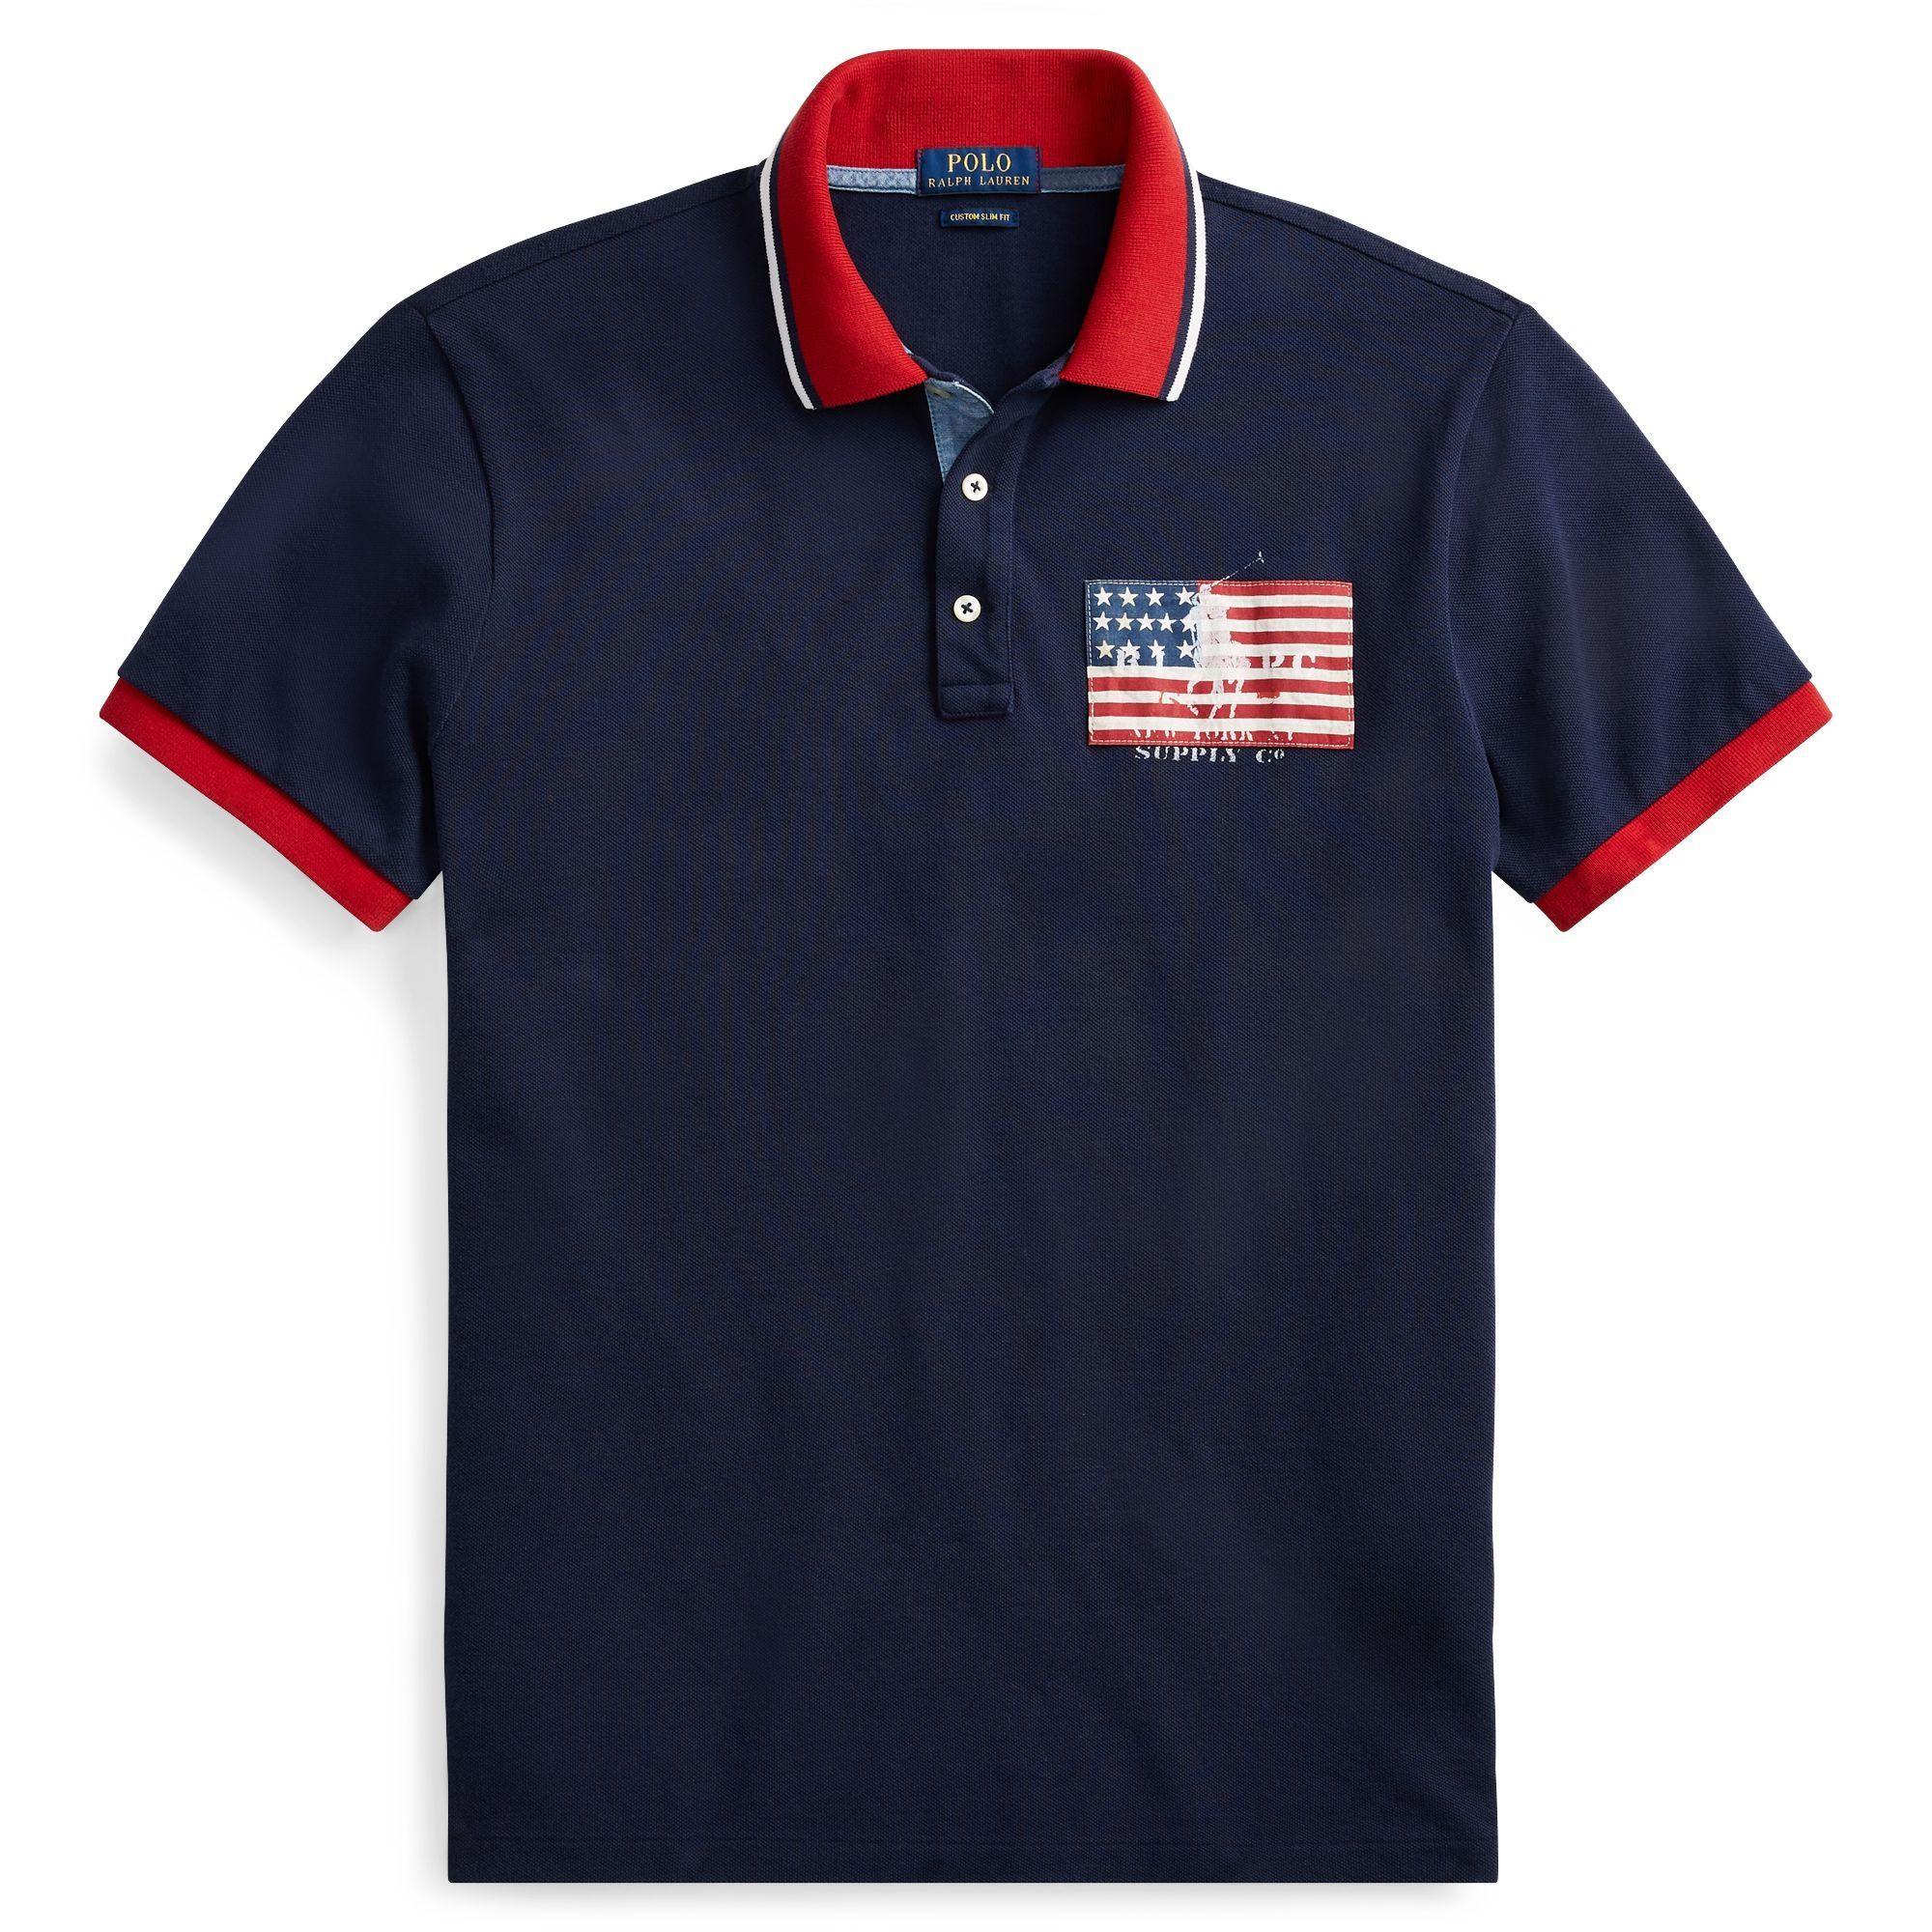 e255c75a Polo Ralph Lauren Classic Fit Cotton T-Shirt   Shirts & Tops ...